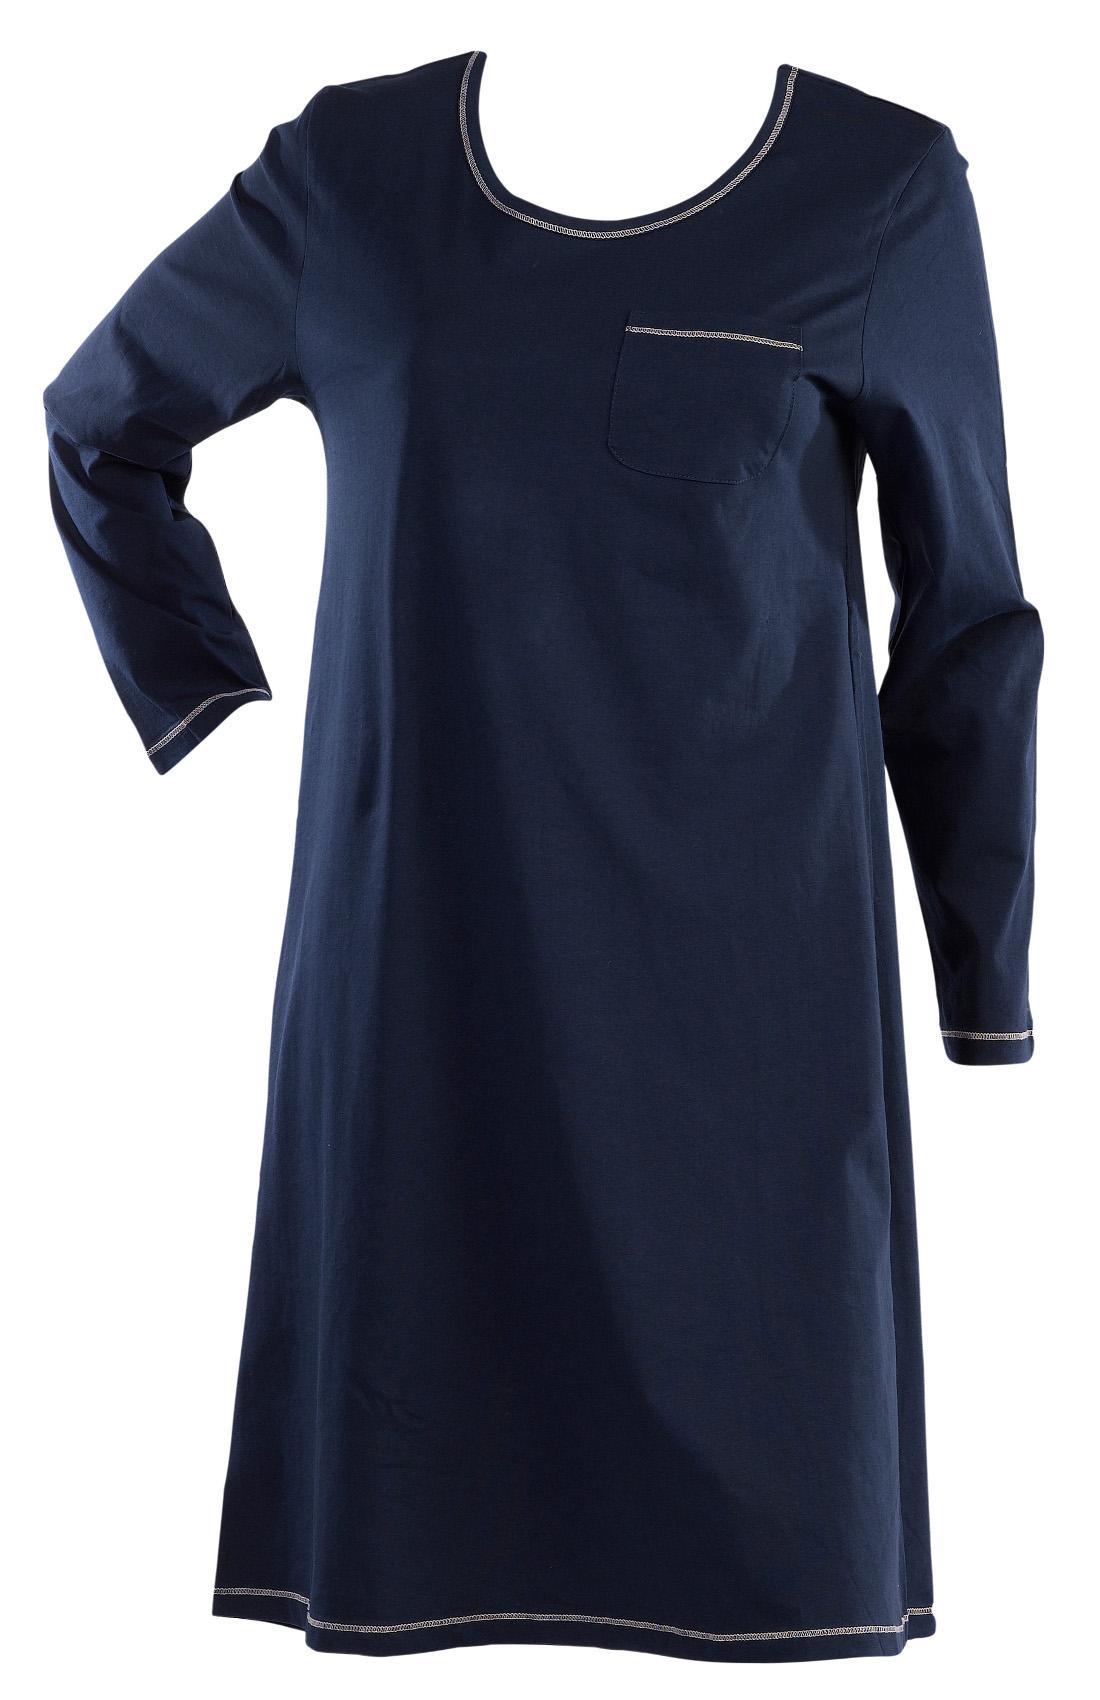 Black t shirt nightdress - Black T Shirt Nightie Ladies Slenderella 100 Cotton Jersey Nightdress Plain Long Download